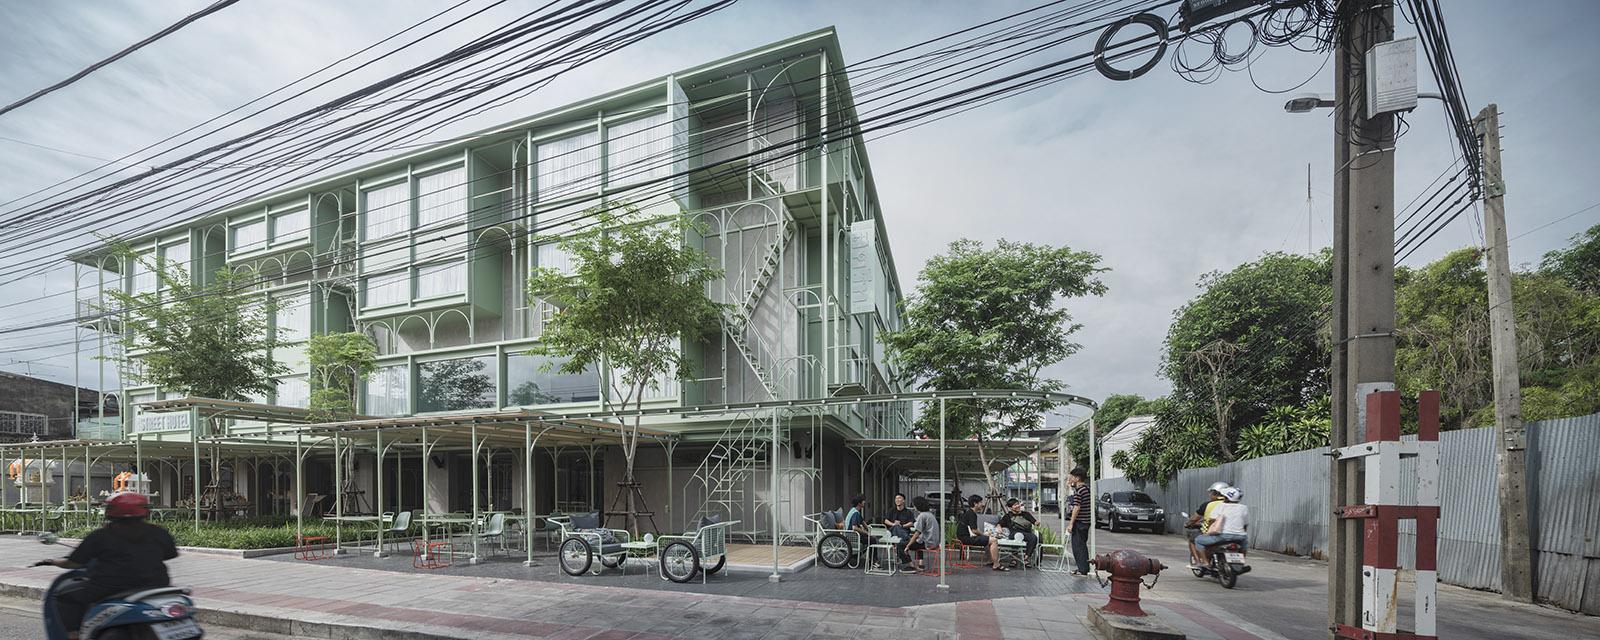 Samsen Street Hotel in Bangkok, Thailand, by CHAT Architects